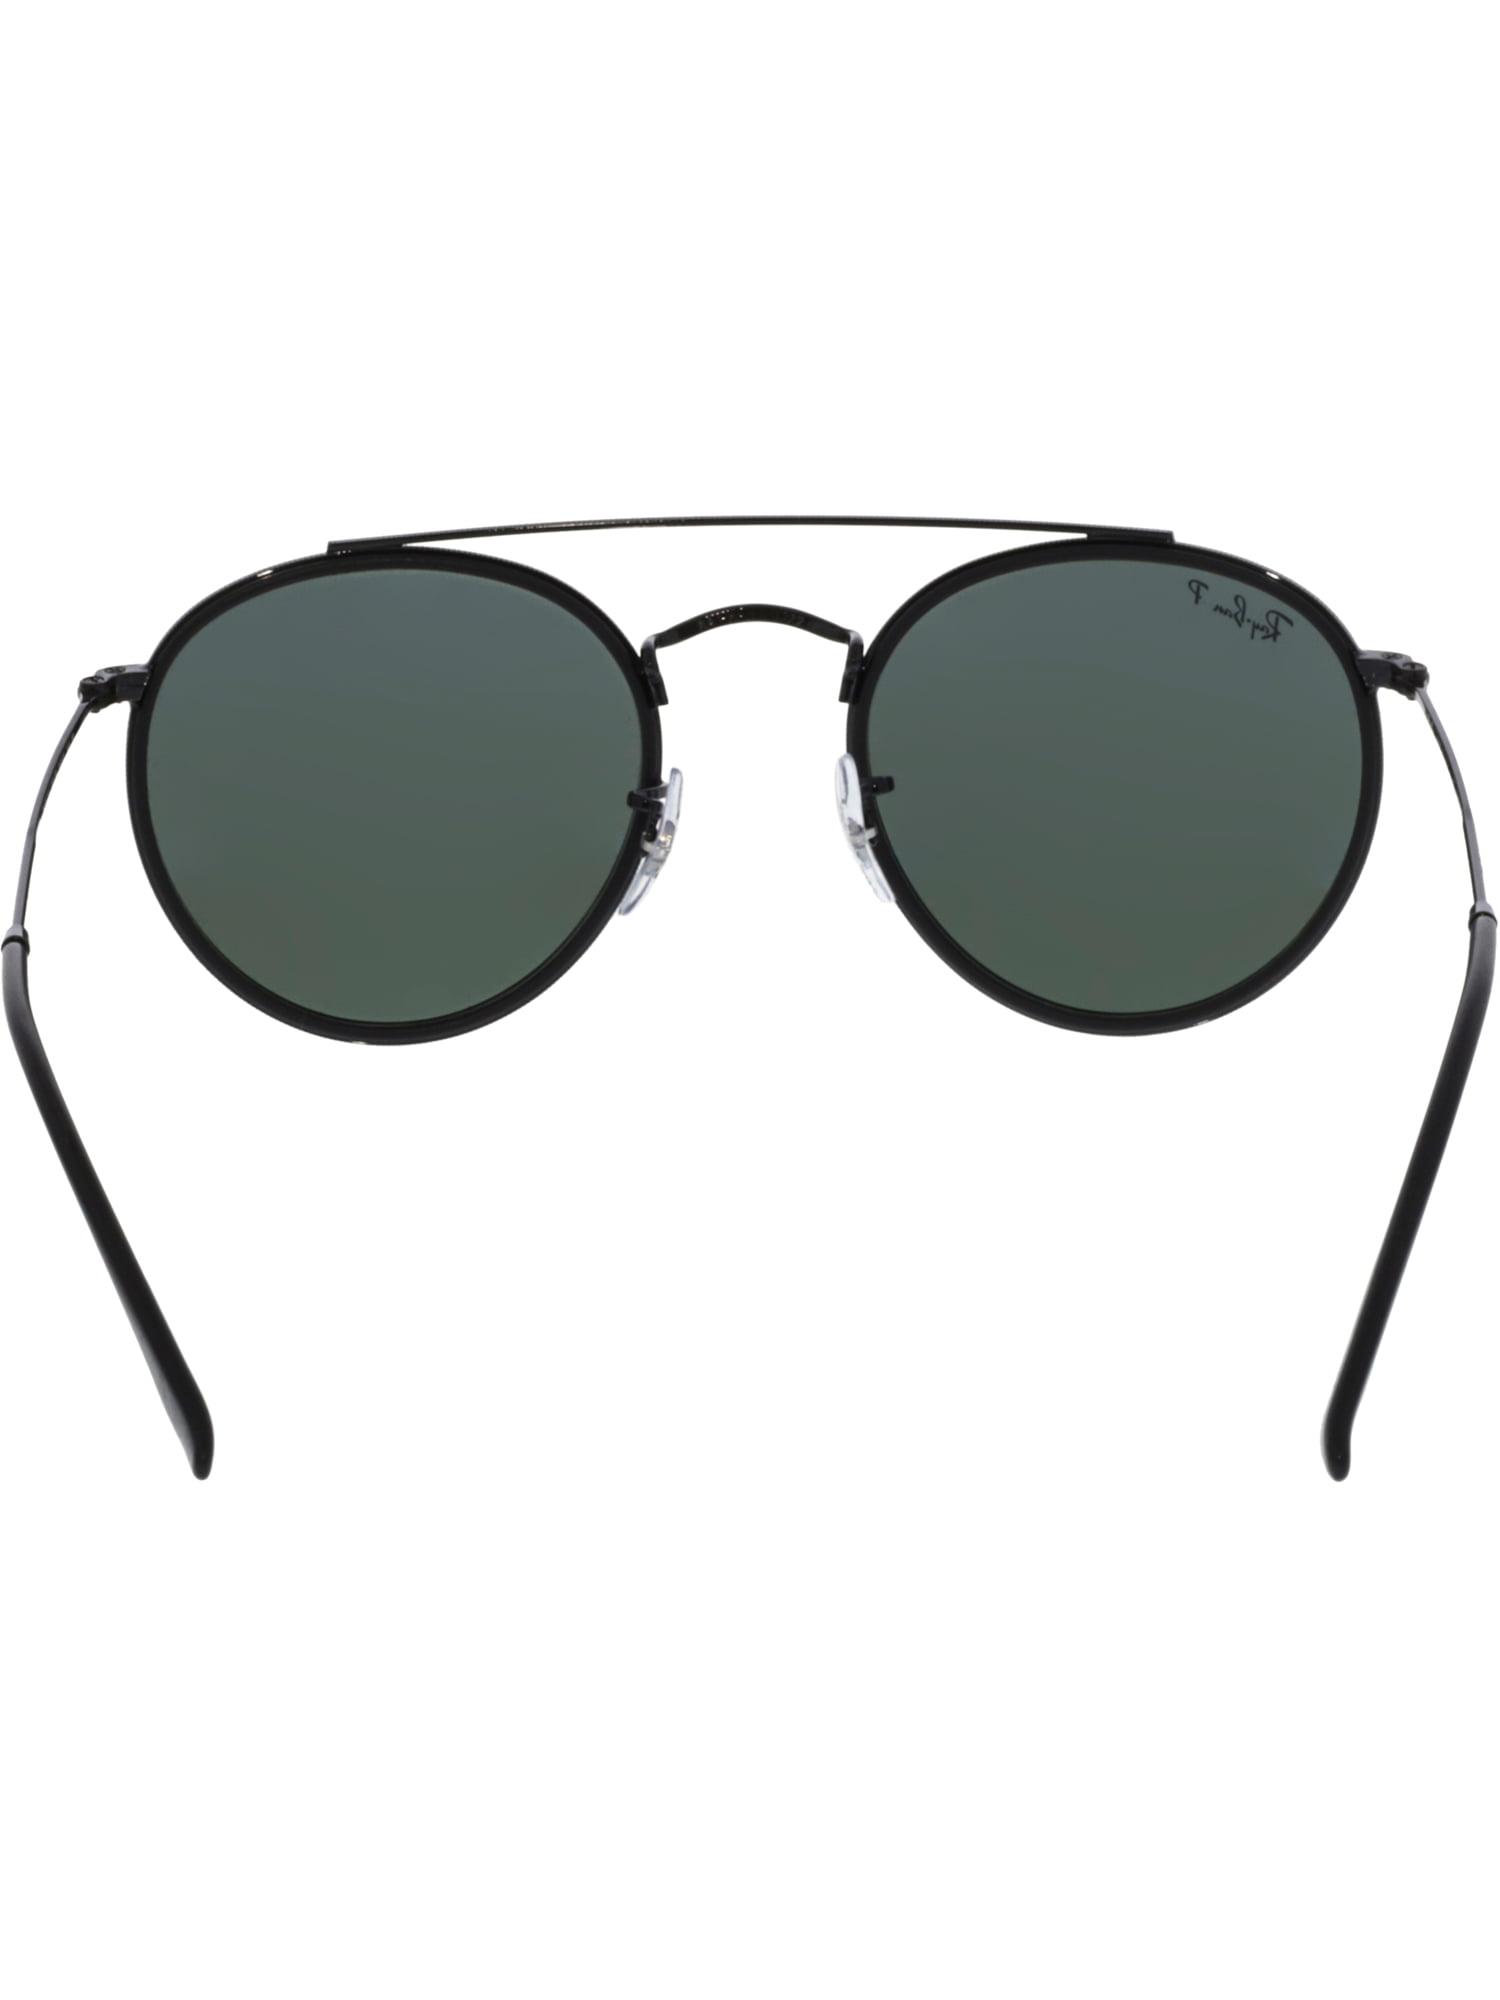 4e8467b40ed4bc Ray-Ban - Ray-Ban Round Double Bridge Black Sunglasses